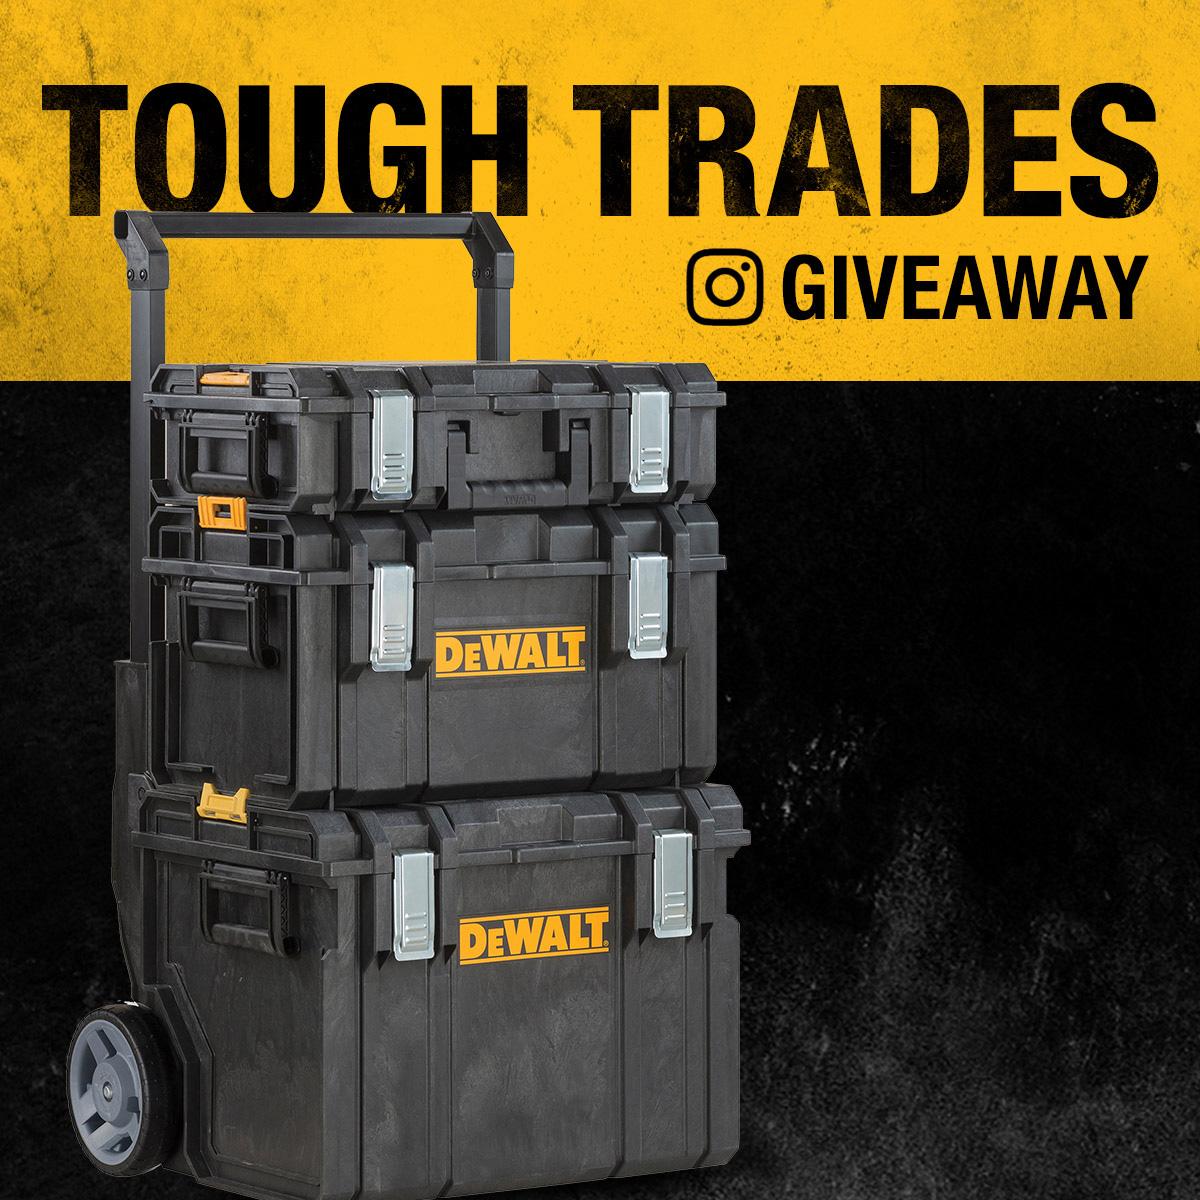 DEWALT Tough Trades Giveaway